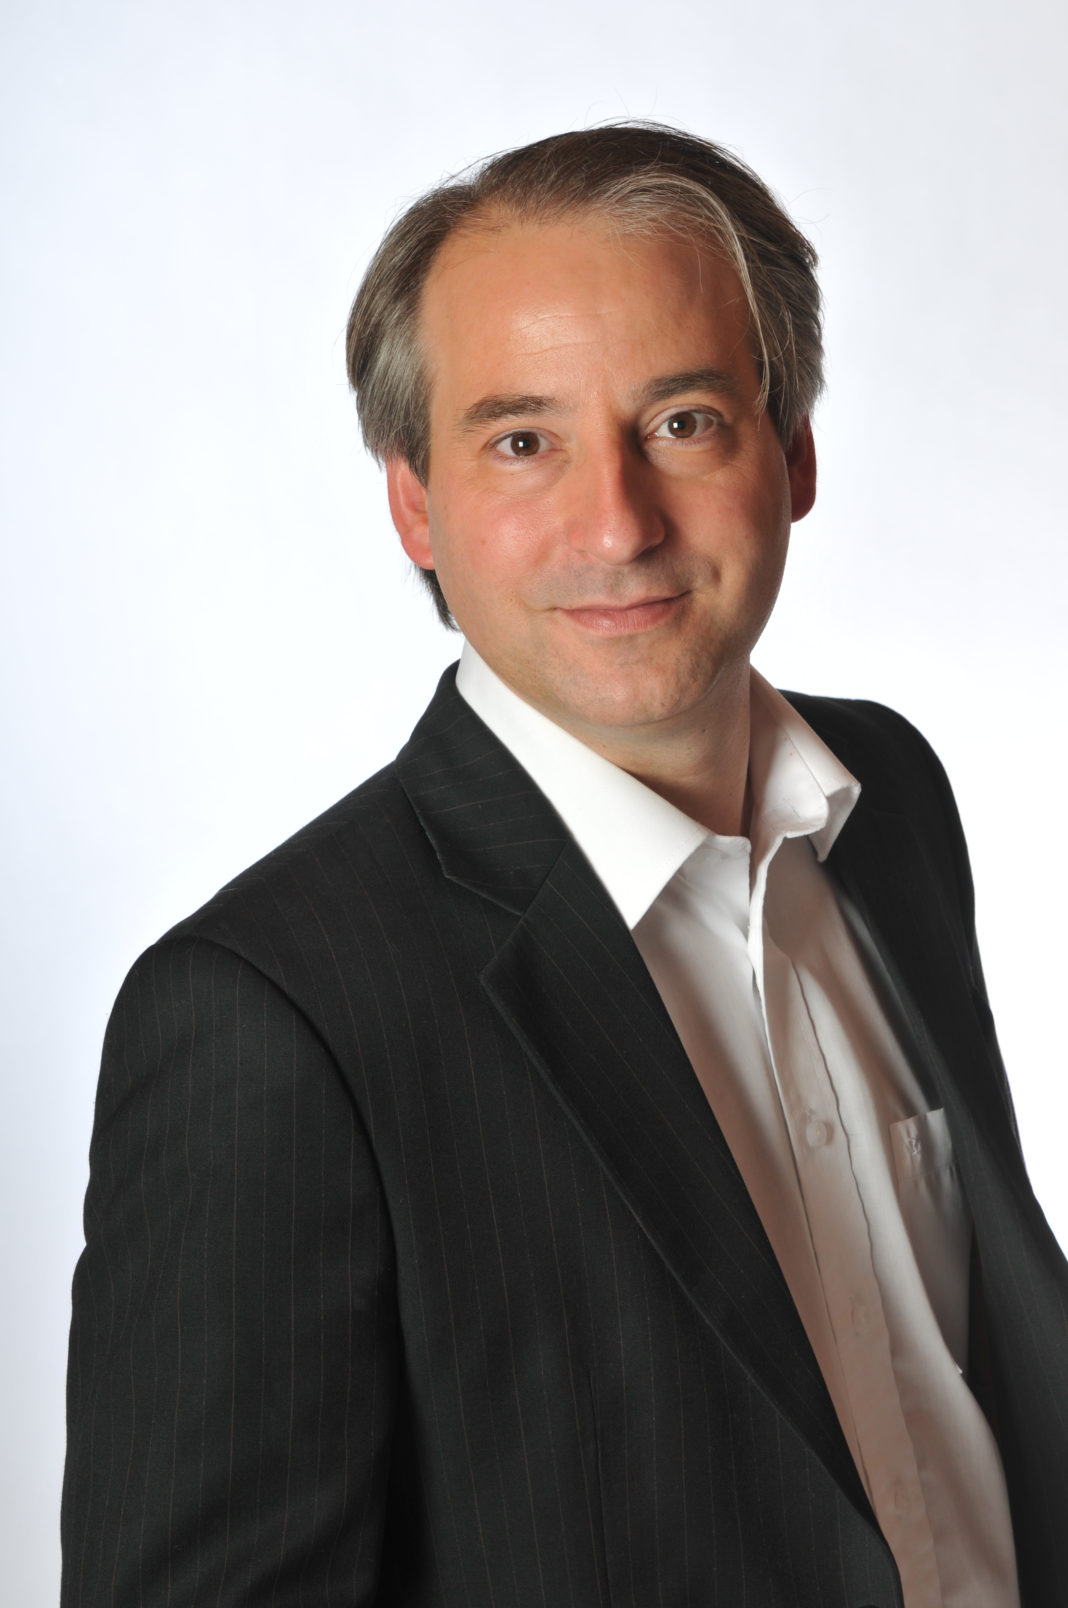 Thomas Schorrenberg verstärkt rikutis am Standort Hamburg